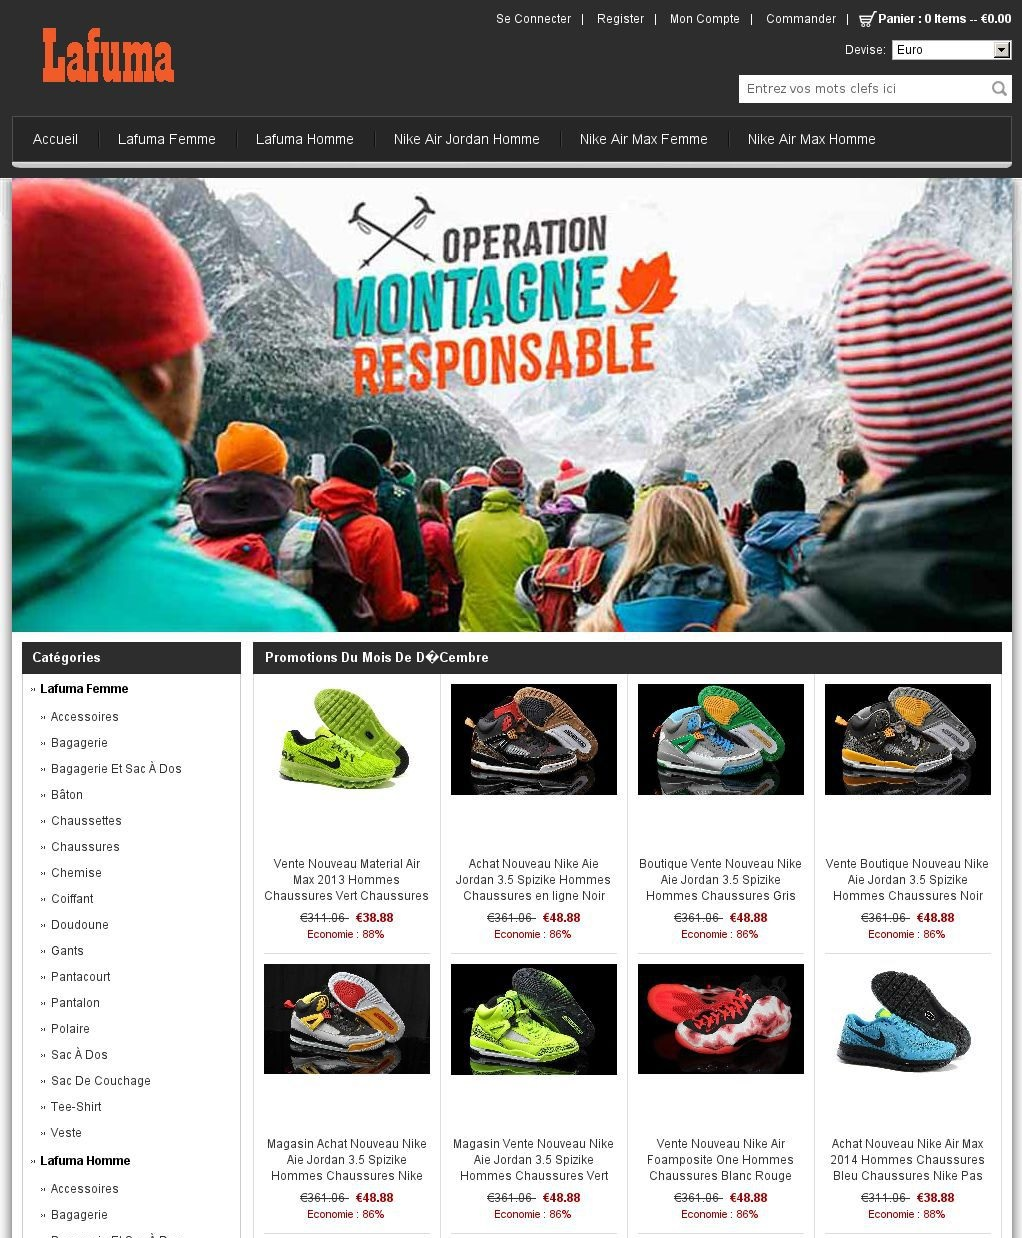 Boutique Contrefaçon Lafuma Cybersquatting Nom Domaine